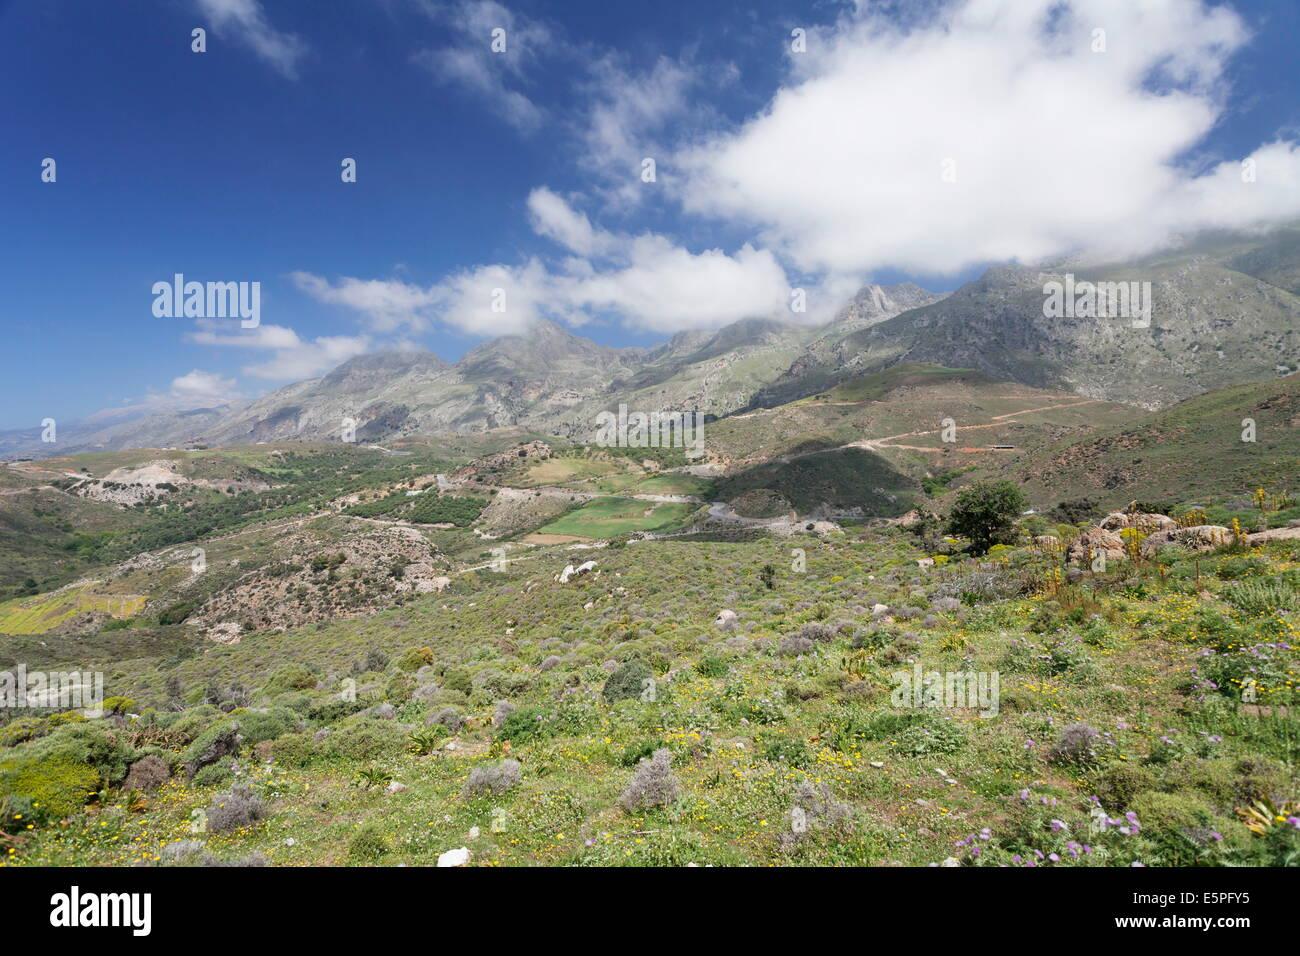 Mountain landscape in the hinterland of Frangokastello and Rodakino, South Crete, Crete, Greek Islands, Greece, - Stock Image